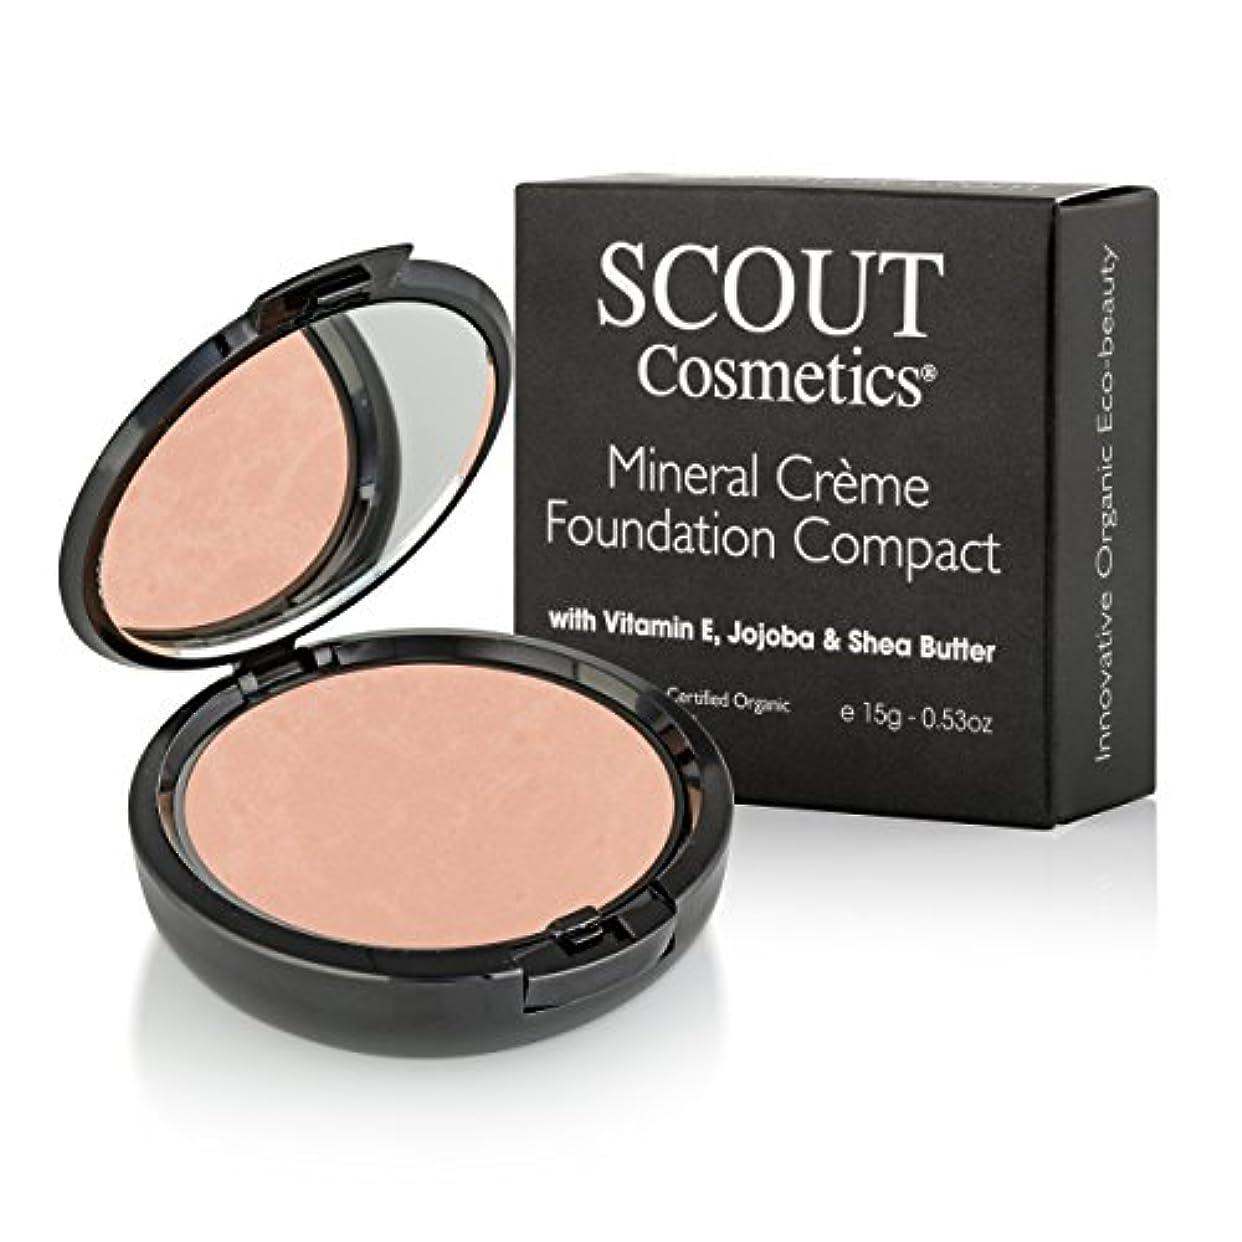 解説歴史的特殊SCOUT Cosmetics Mineral Creme Foundation Compact SPF 15 - # Camel 15g/0.53oz並行輸入品